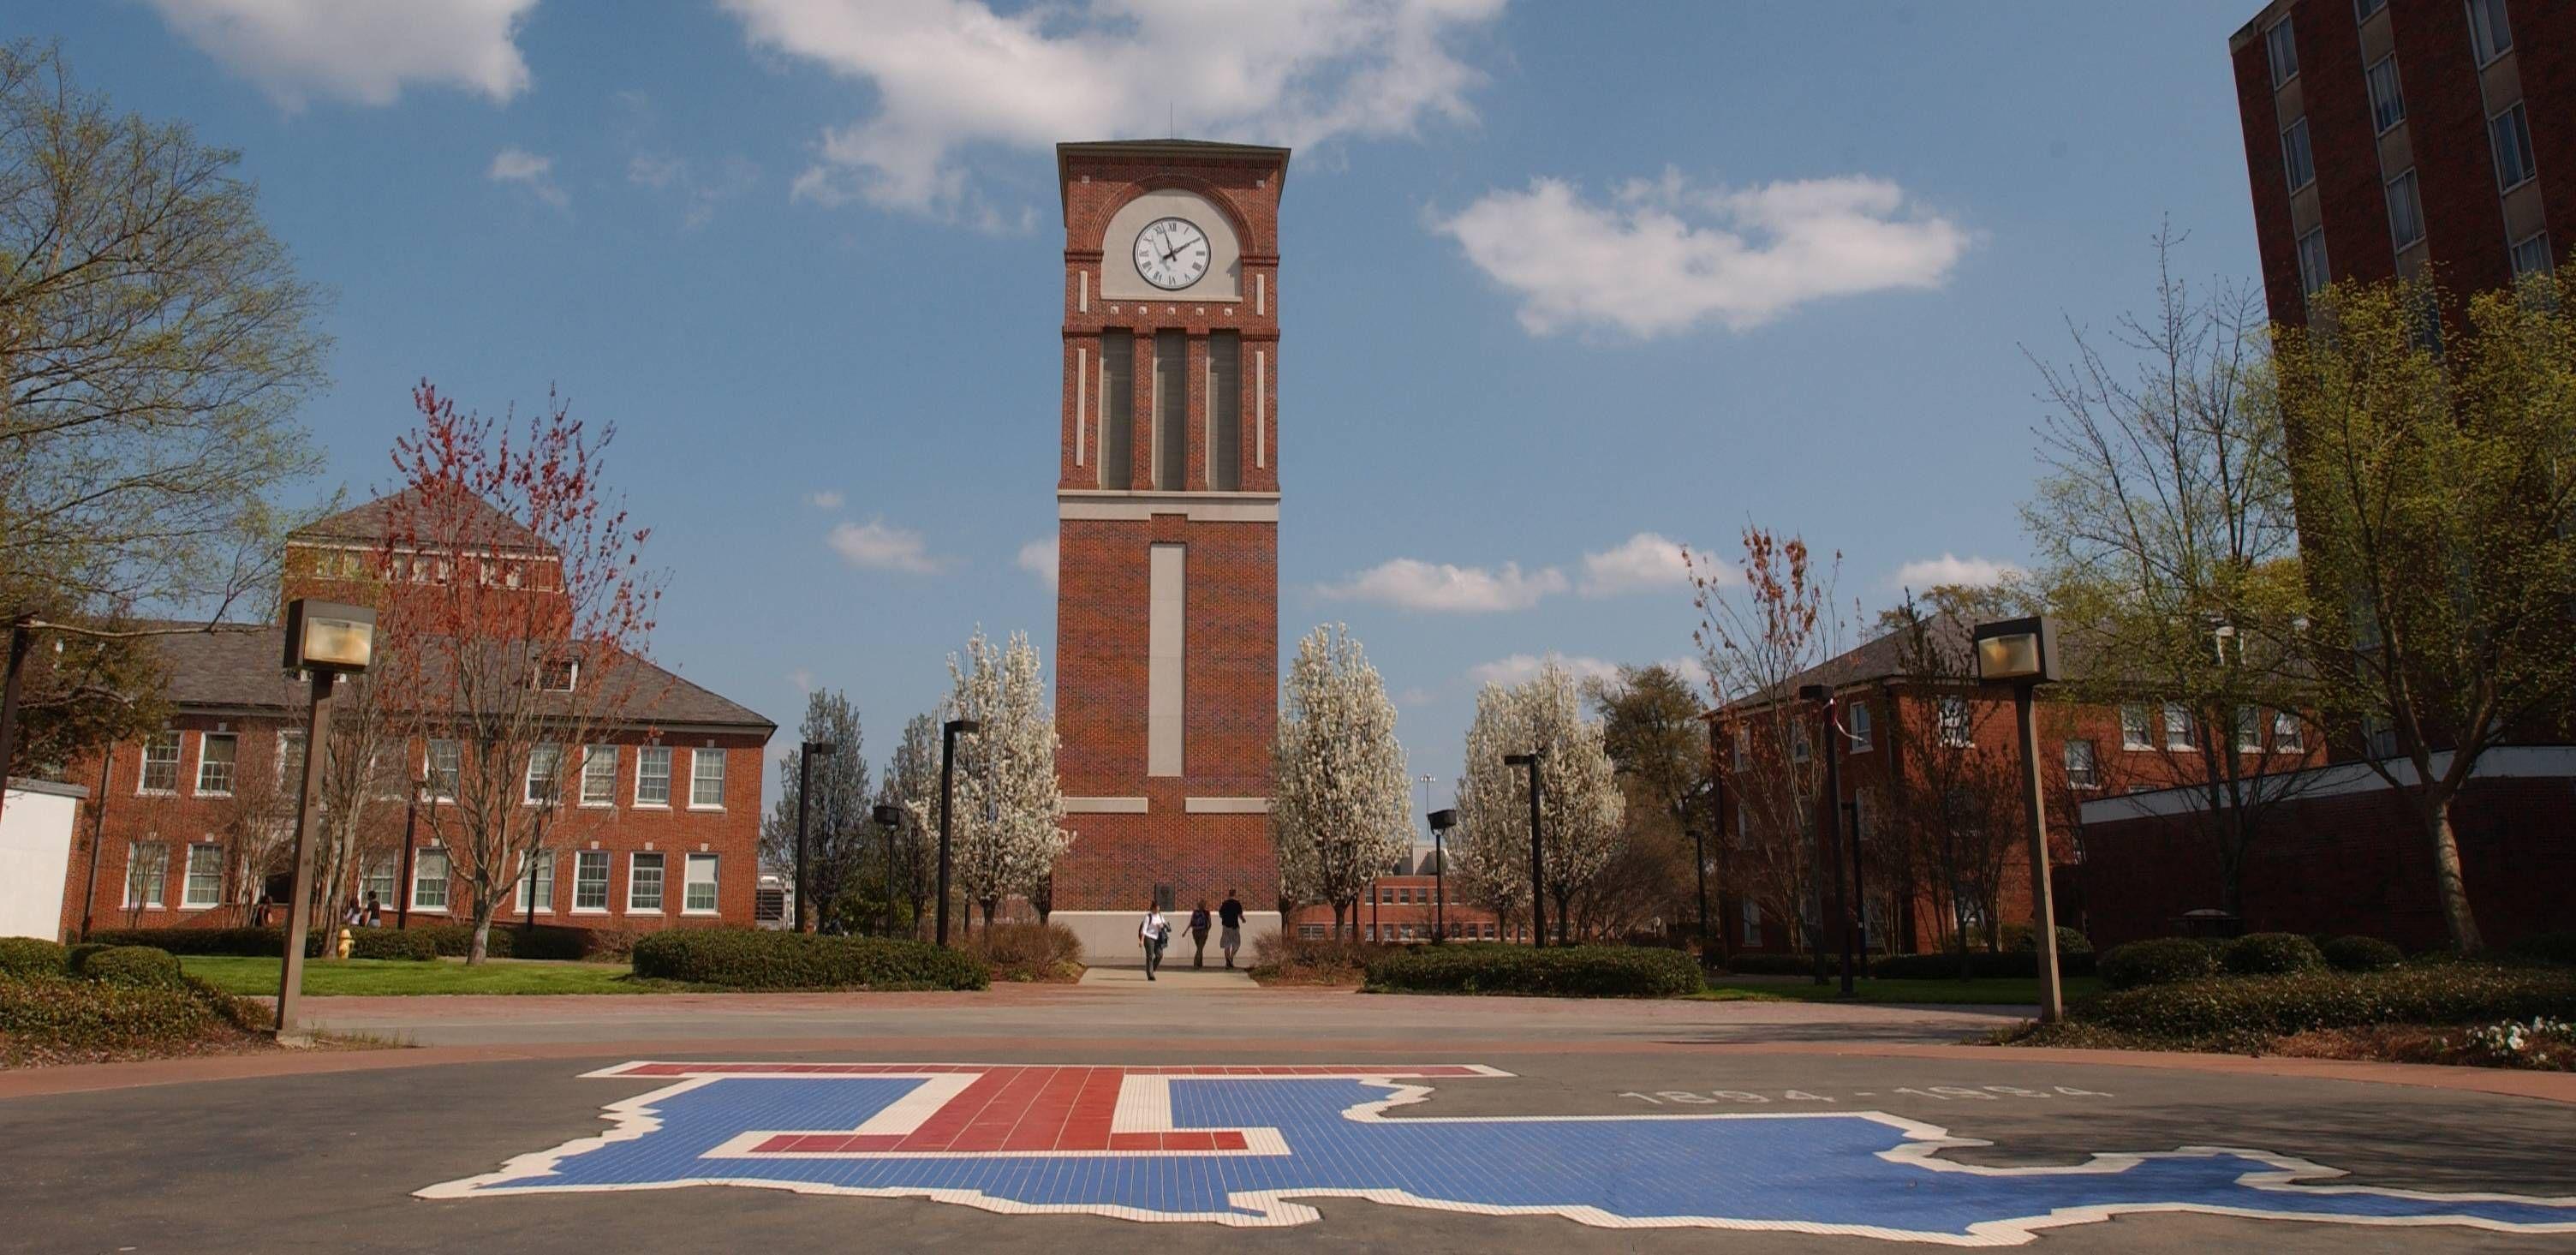 Louisiana Tech Bulldogs campus entrance with clock tower